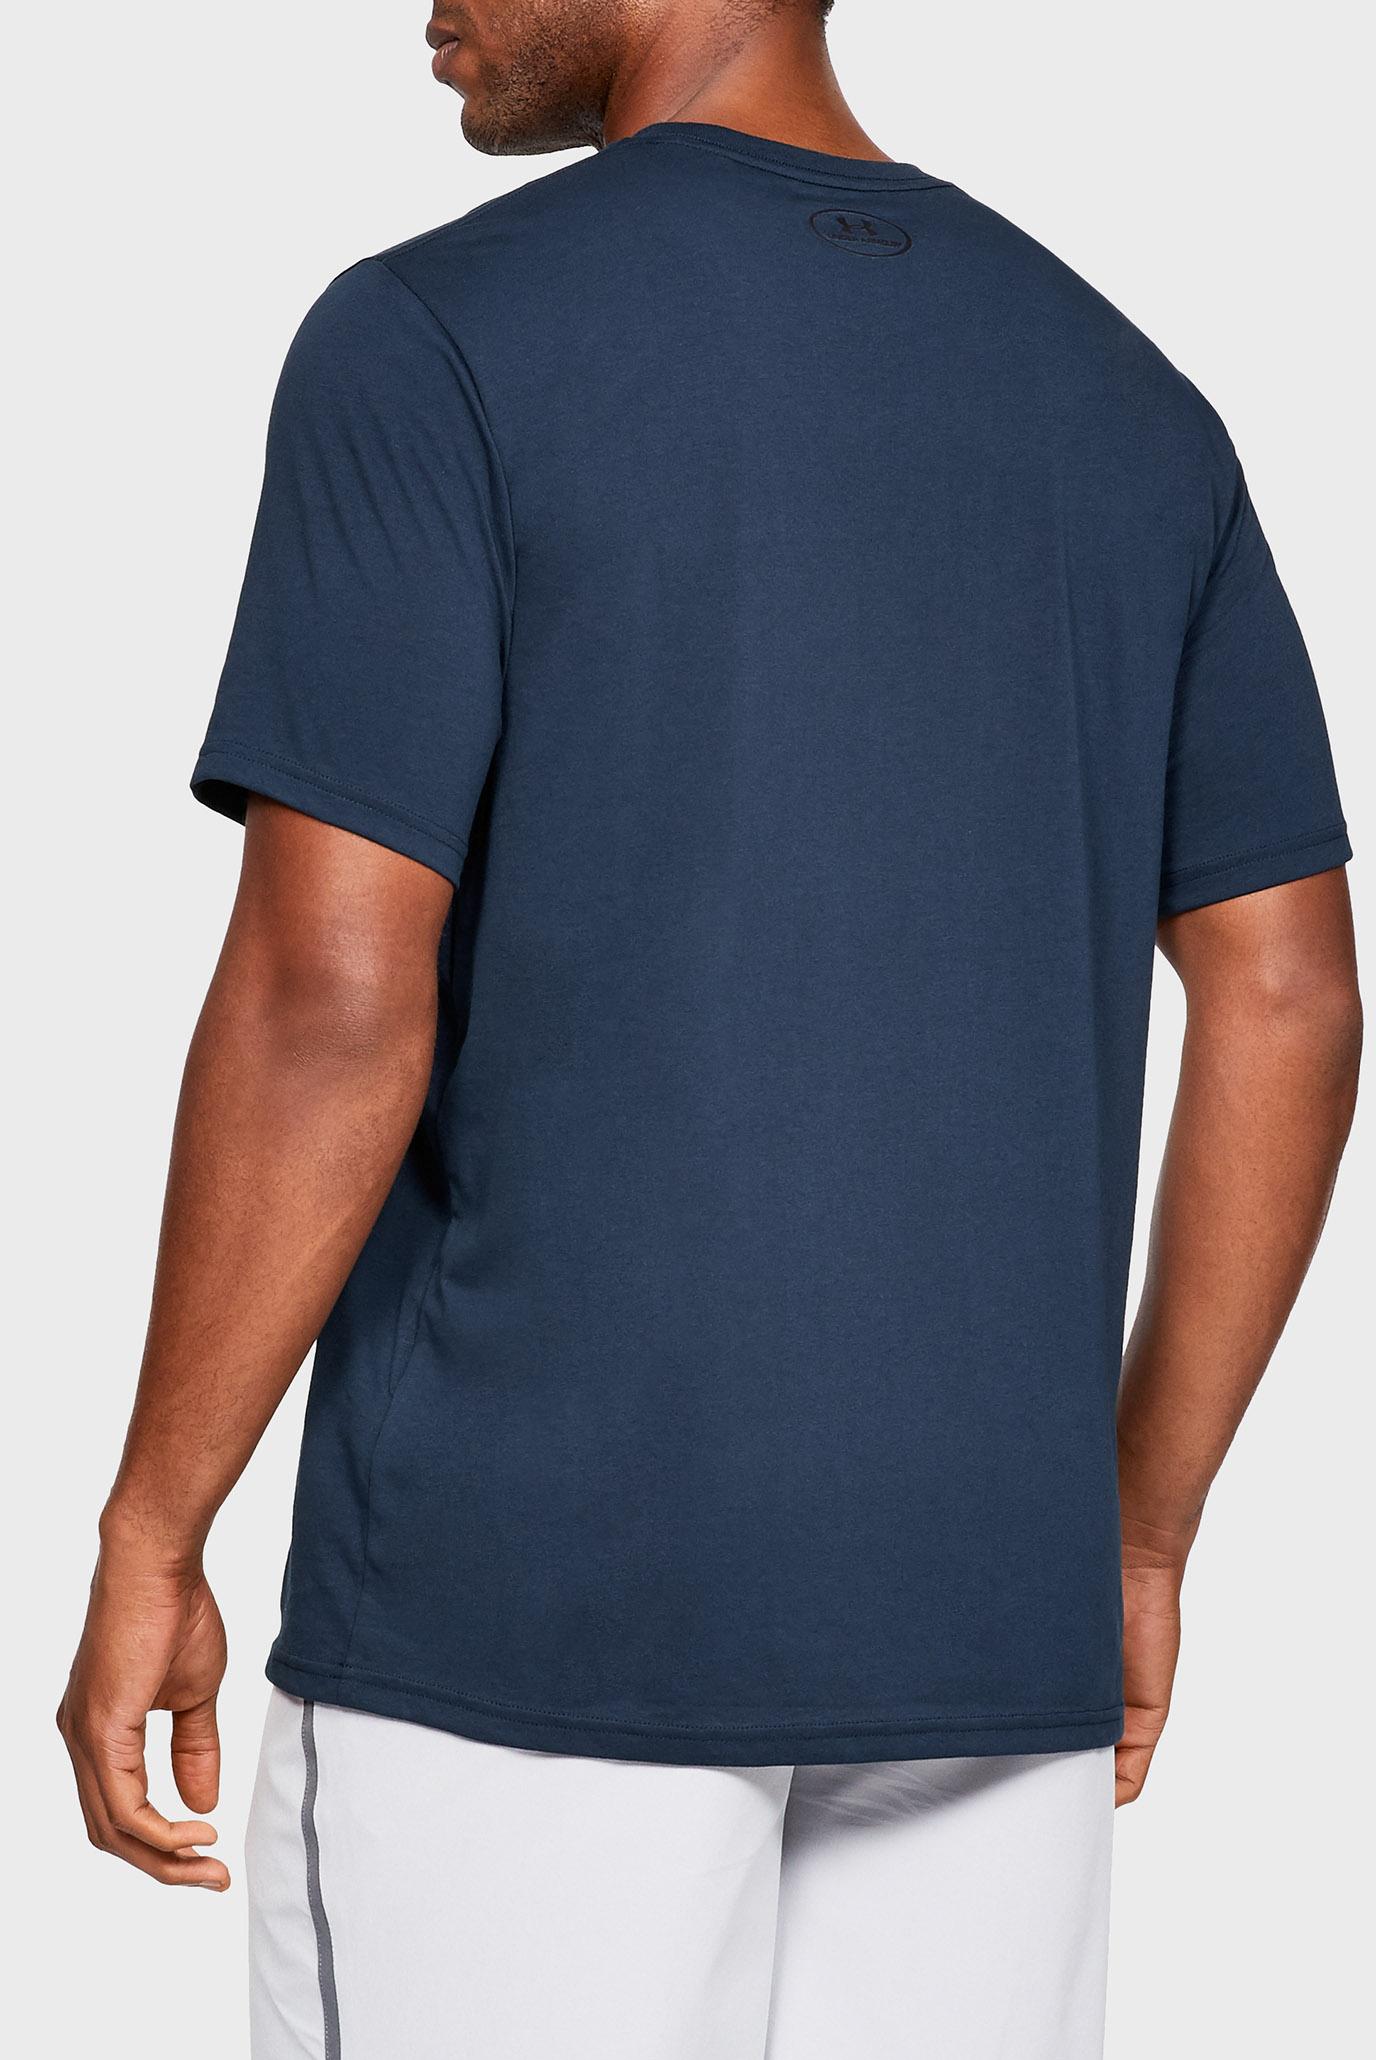 Мужская темно-синяя футболка UA BRANDED BIG LOGO SS Under Armour